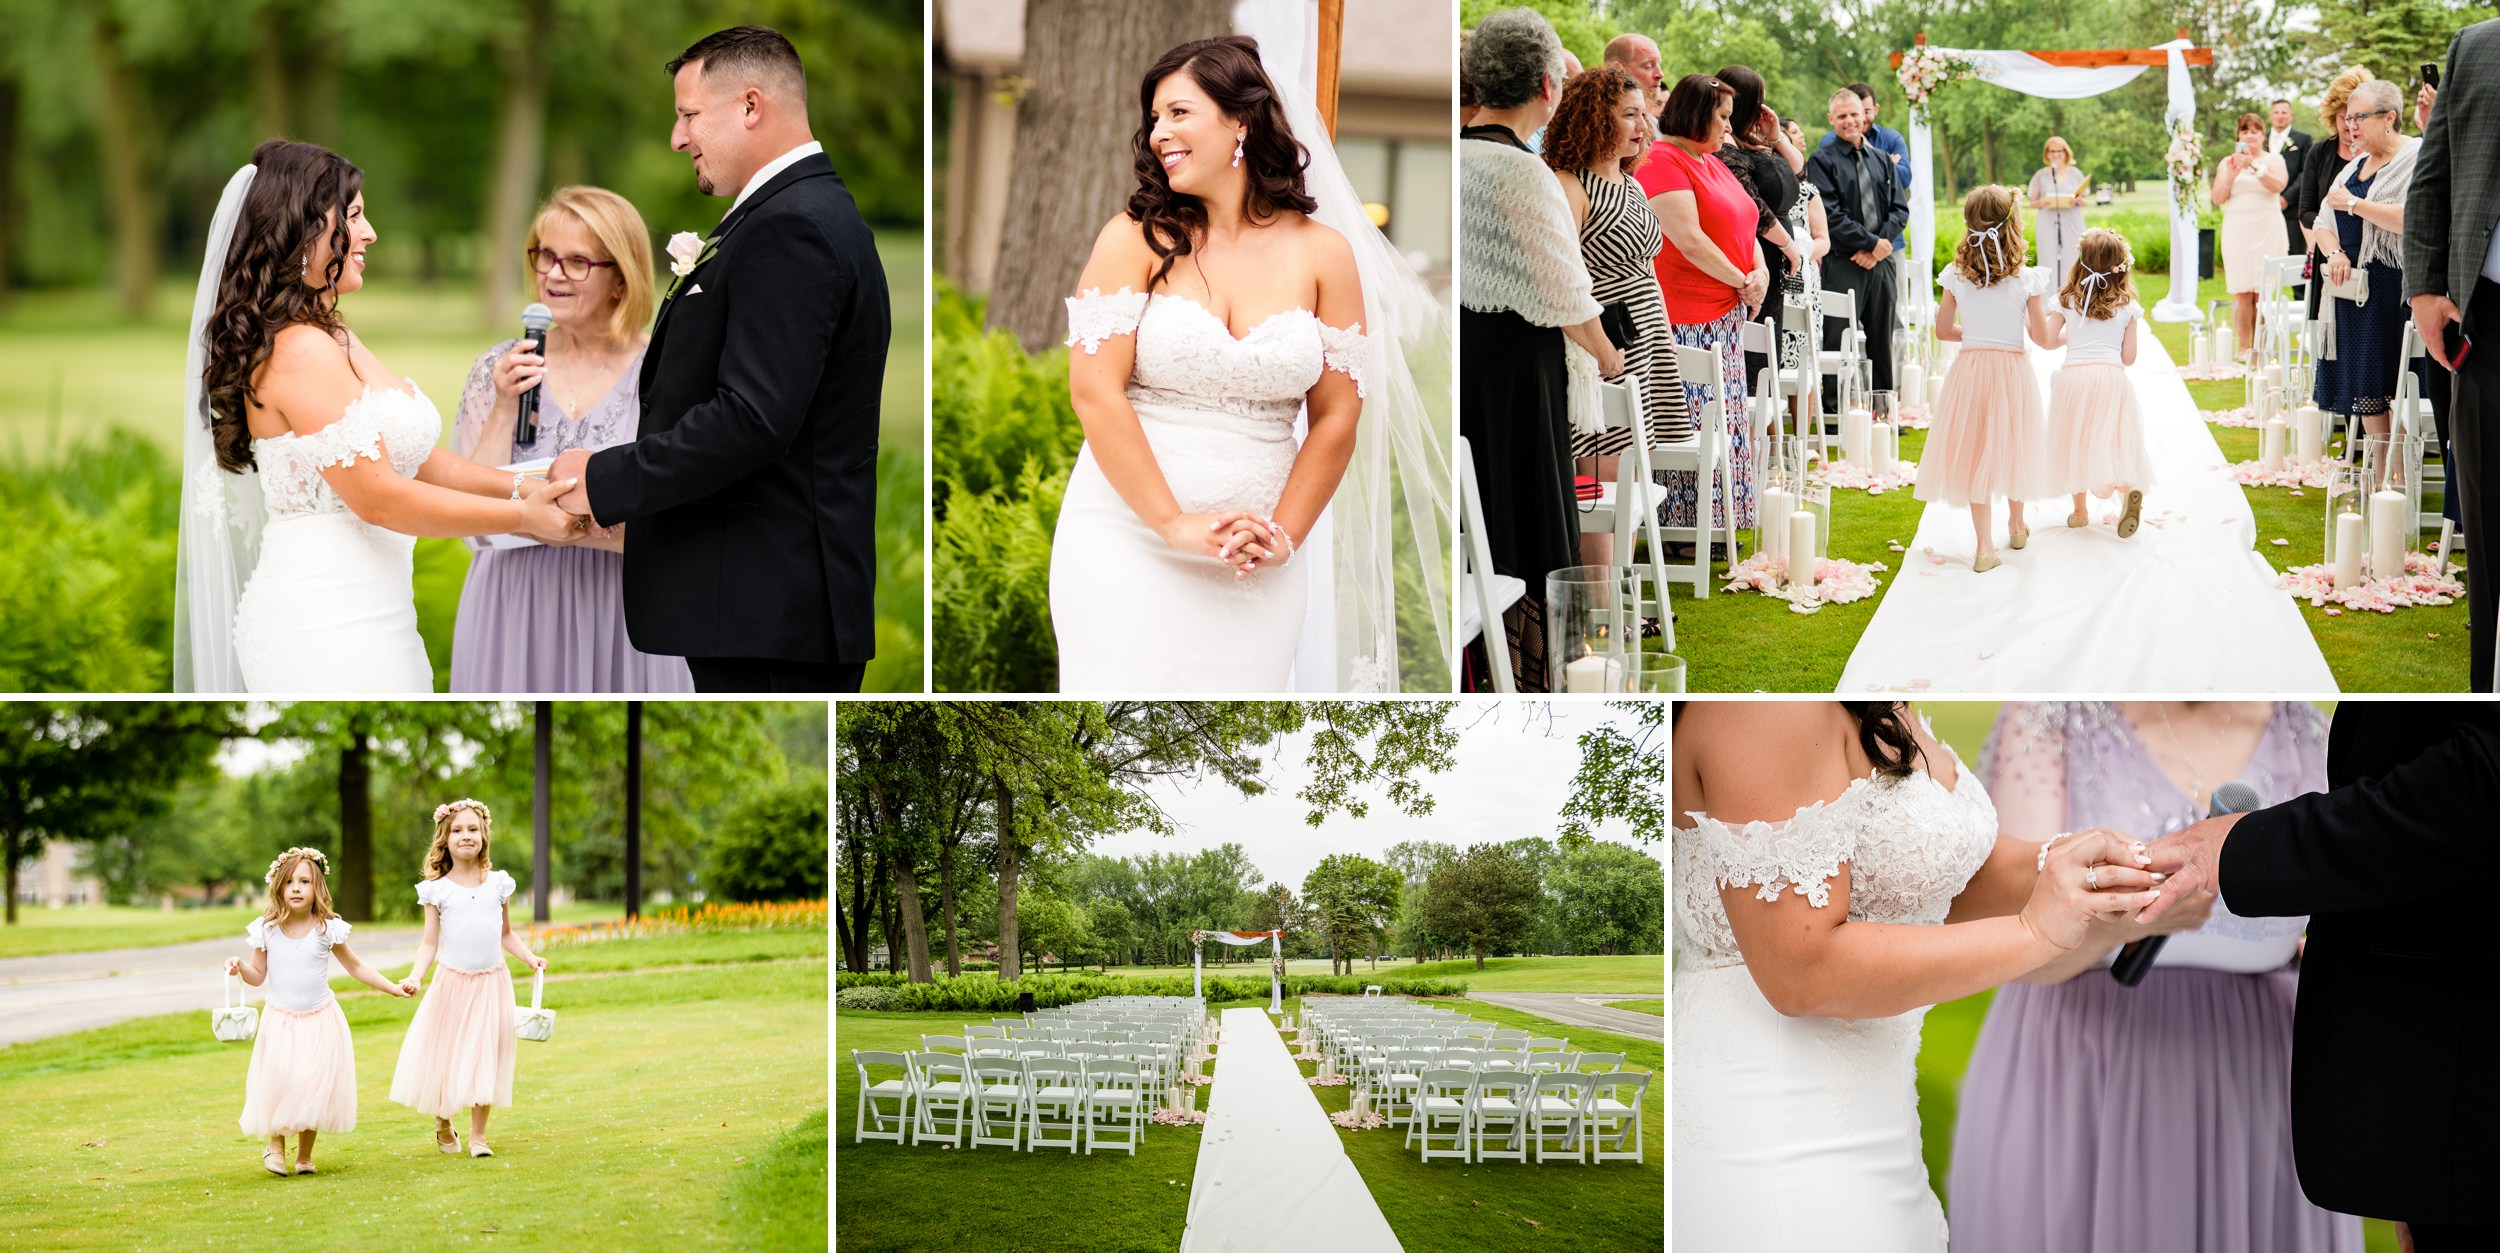 Wedding ceremony at Briar Ridge golf course.